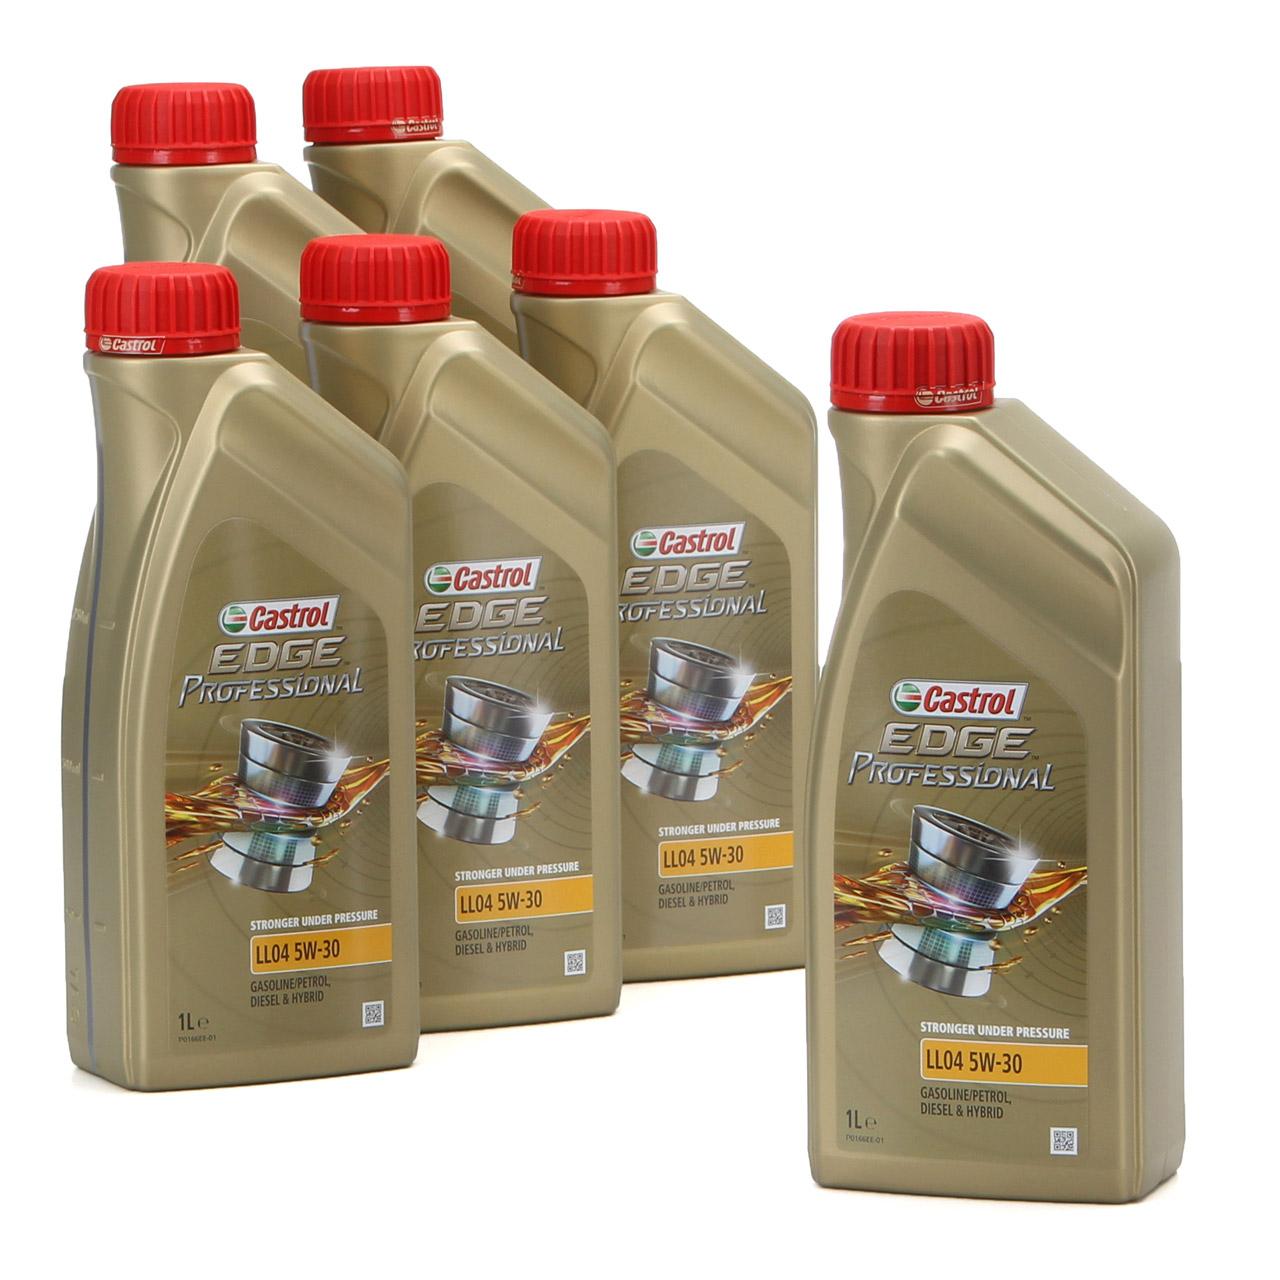 CASTROL EDGE Professional Motoröl Öl für BMW Longlife IV LL04 5W-30 - 6 Liter